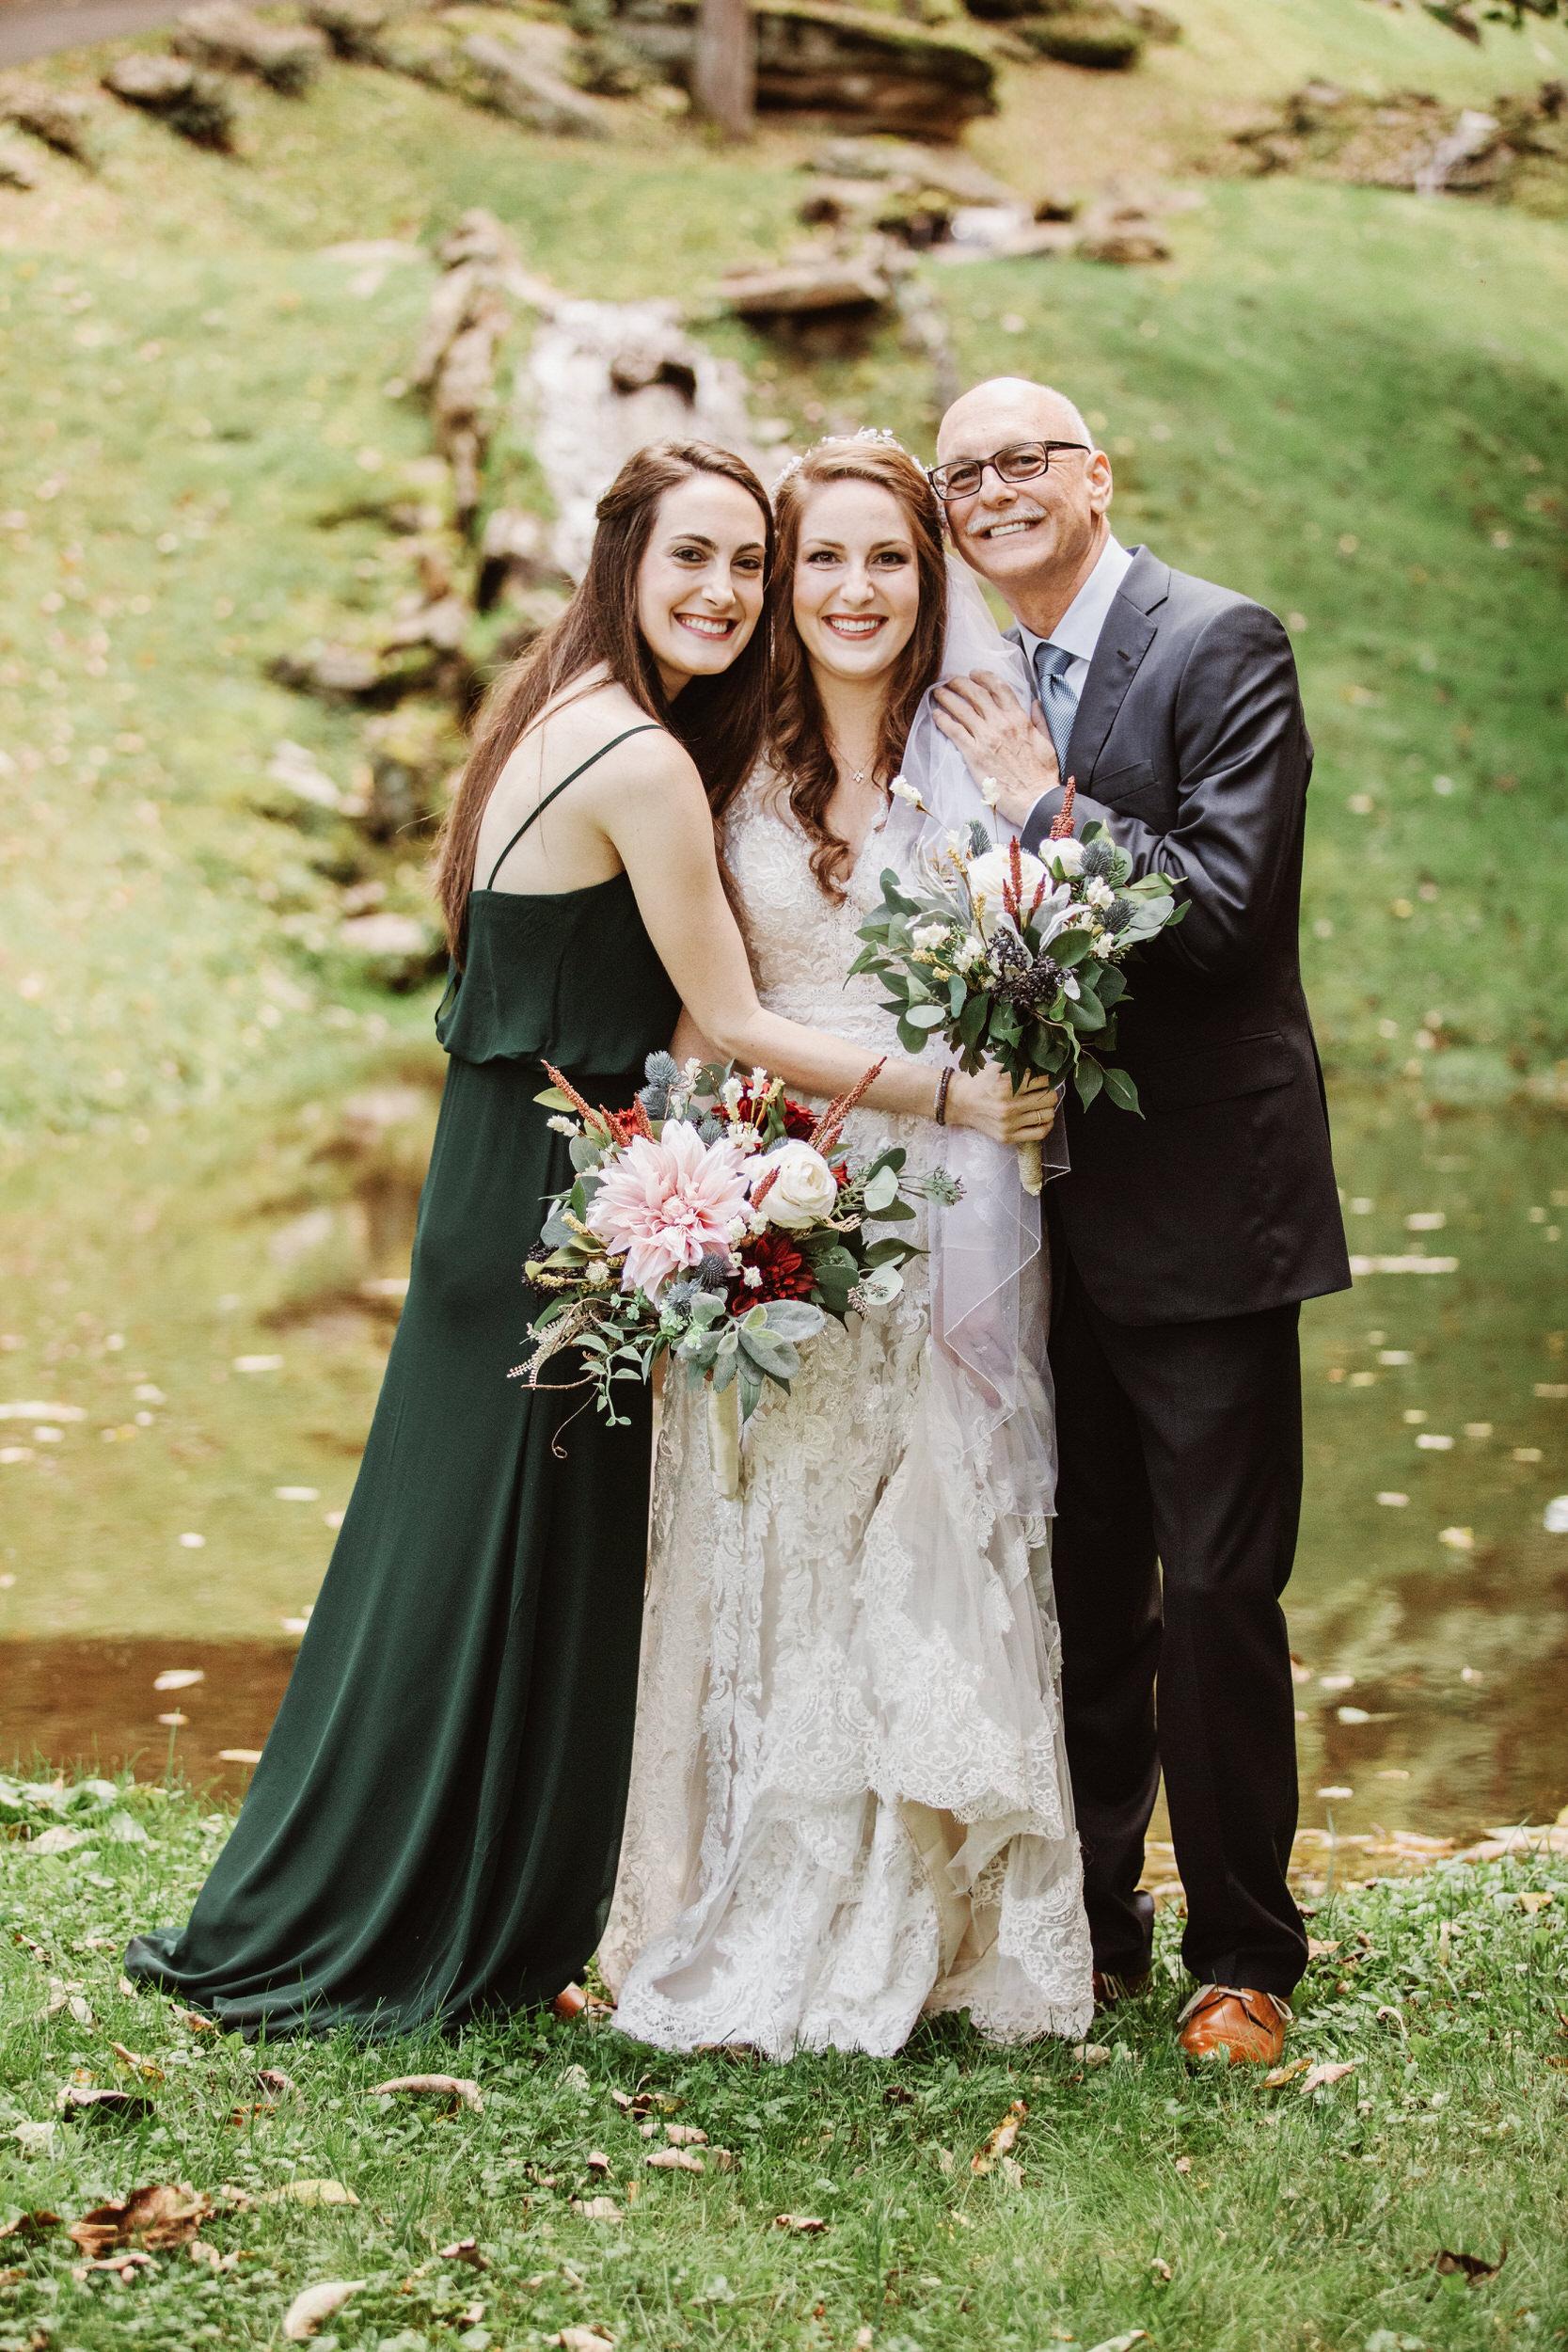 1. Bride's morning- Cole + Rachel's Great Smoky Mountain National Park Elopement-234.jpg